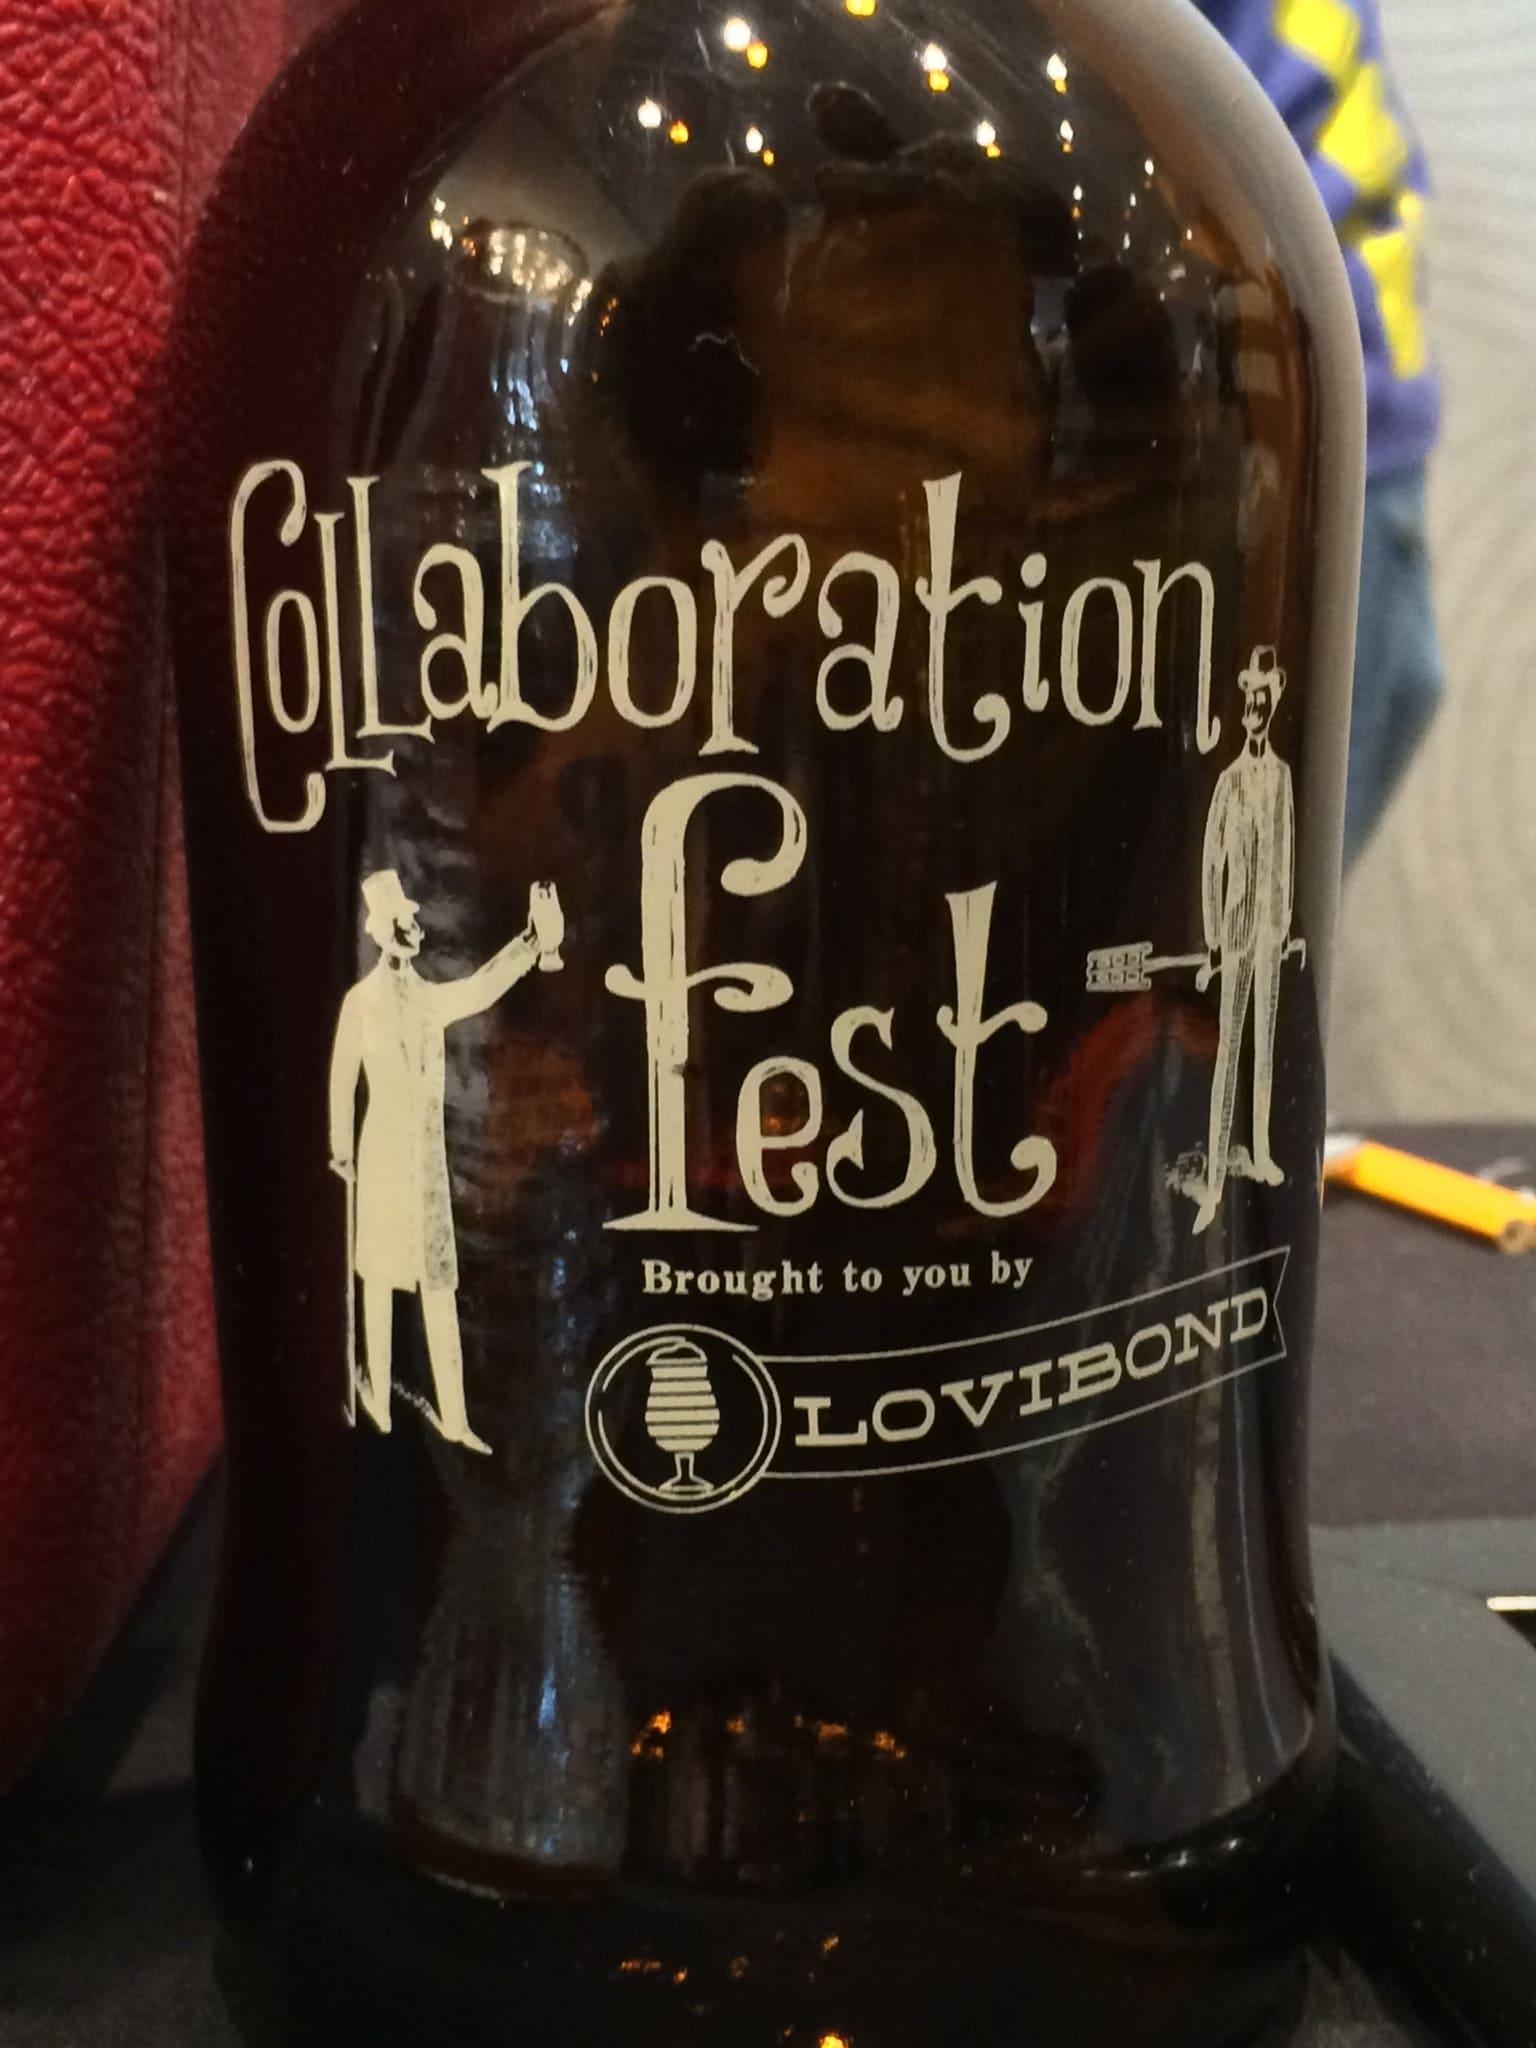 2015 Collaboration Fest is coming to Denver 3/21/2015 | Bottlemakesthree.com